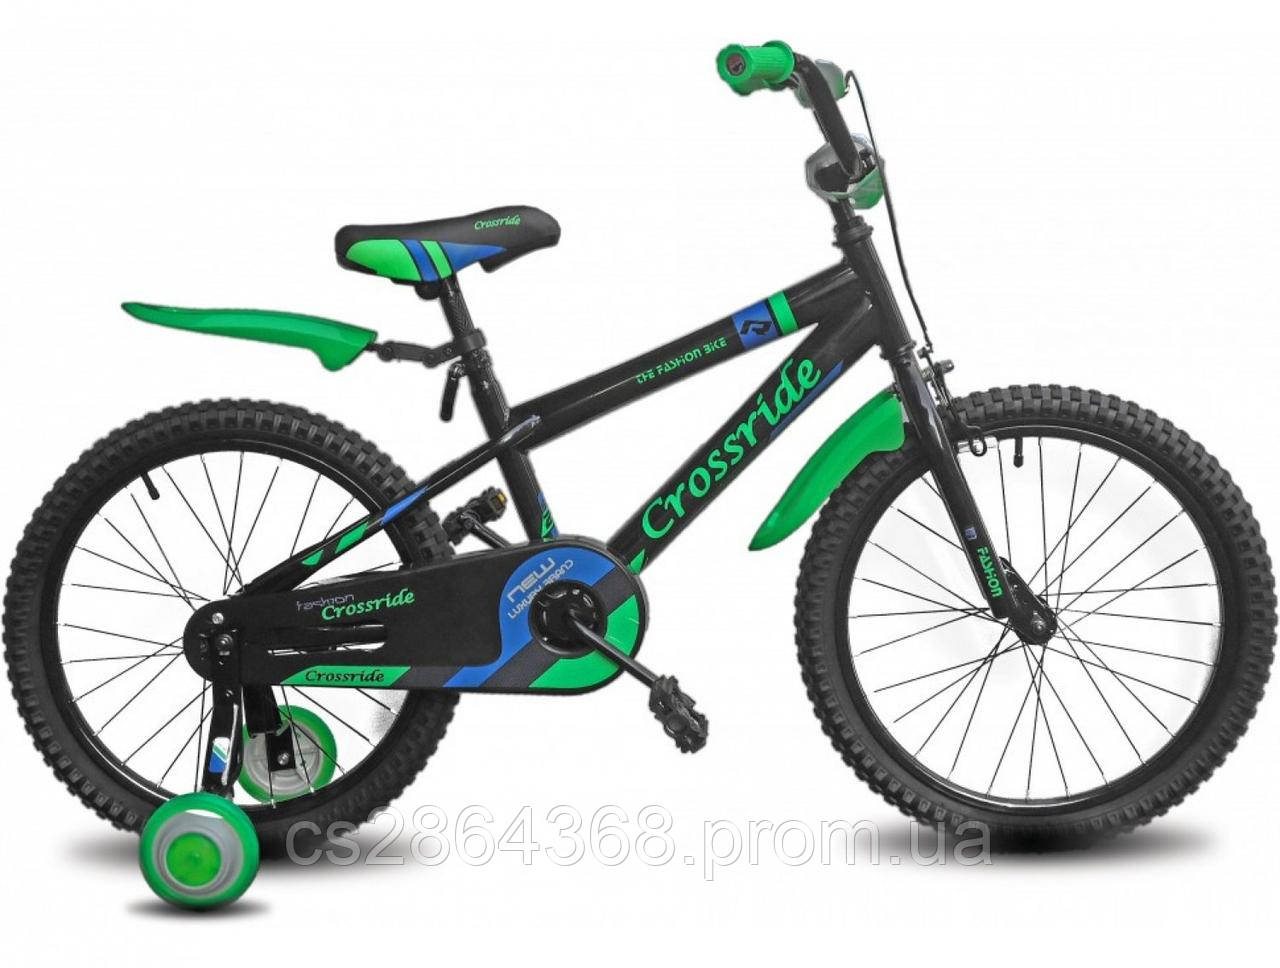 Crossride 20 Fashion Bike